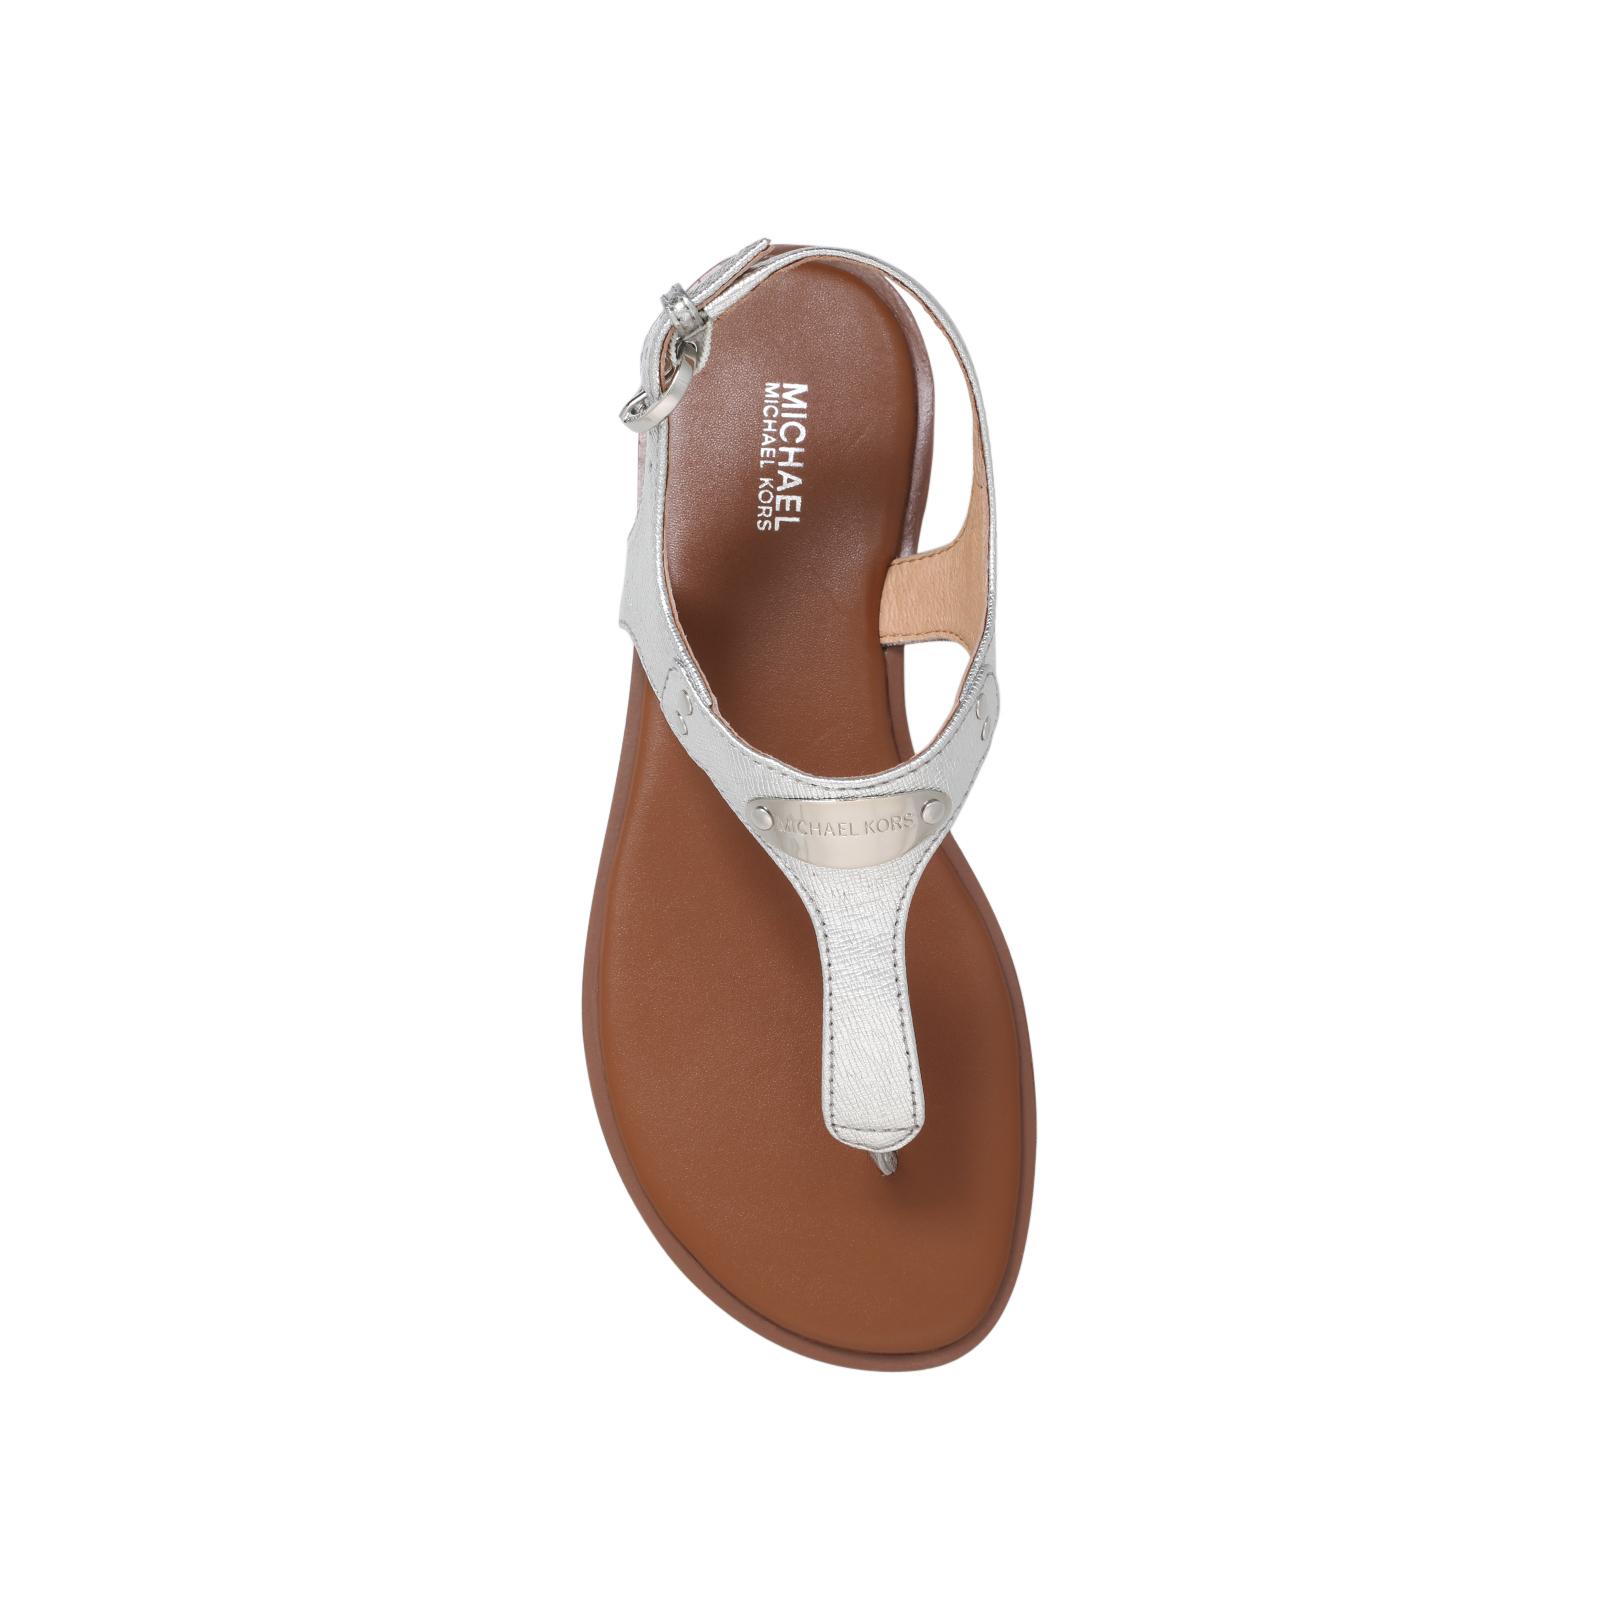 70aec52754a MK PLATE THONG Michael Michael Kors Plate Thong Silver Flat Sandals ...